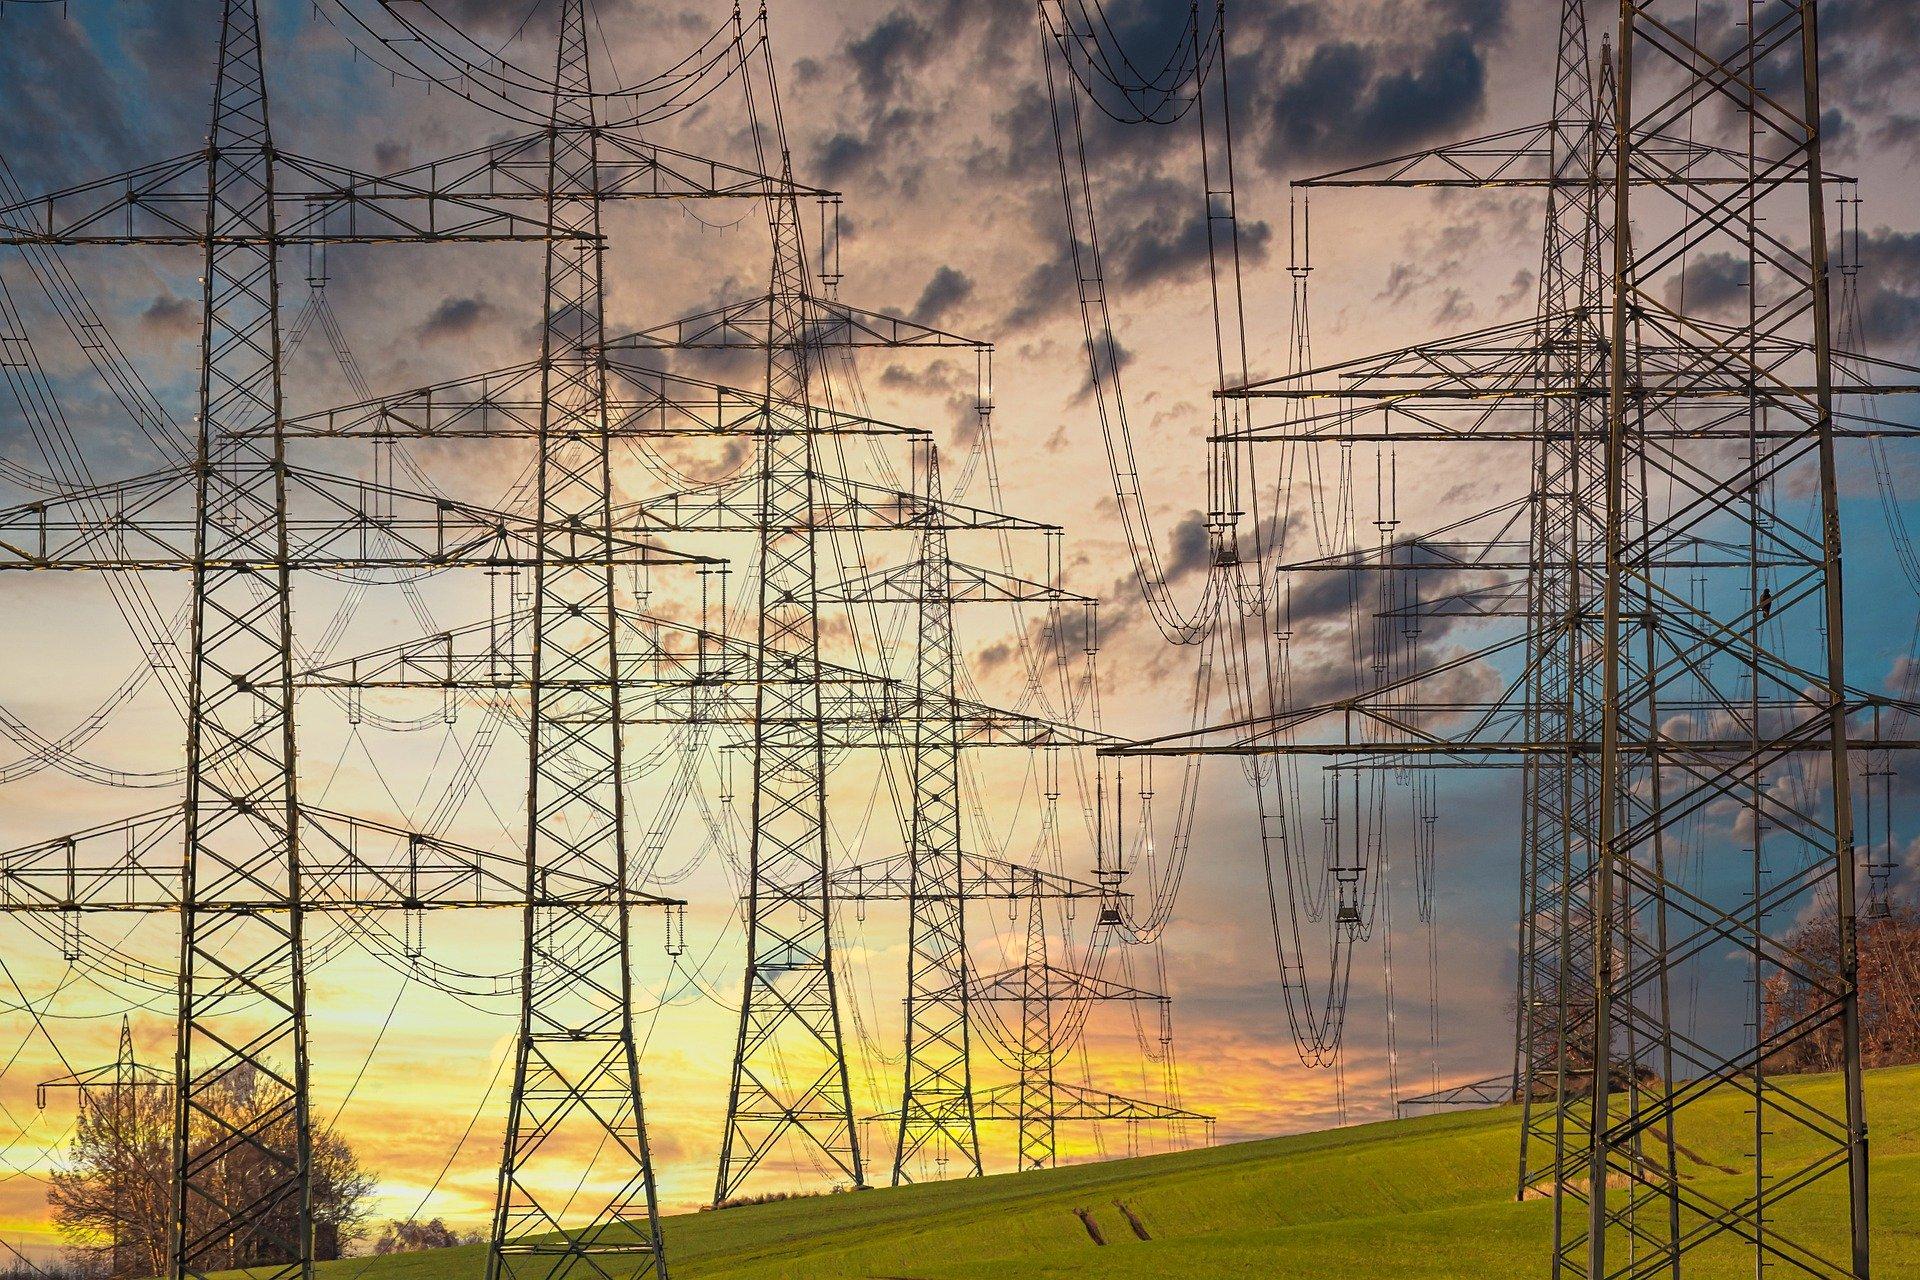 jean-bernard levy arenh poison rentabilite edf - L'Energeeek